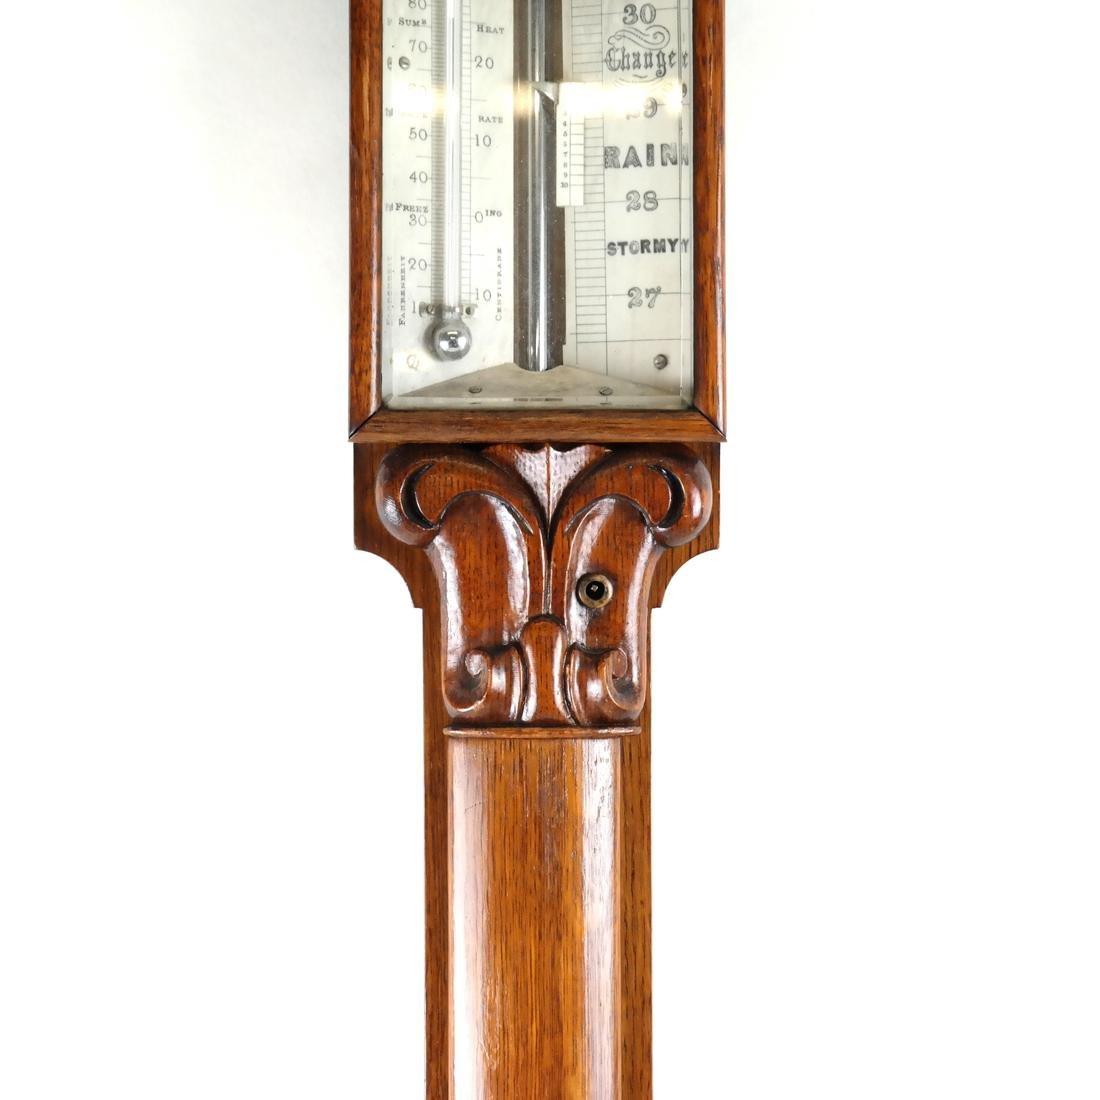 19th Century English Barometer - 3